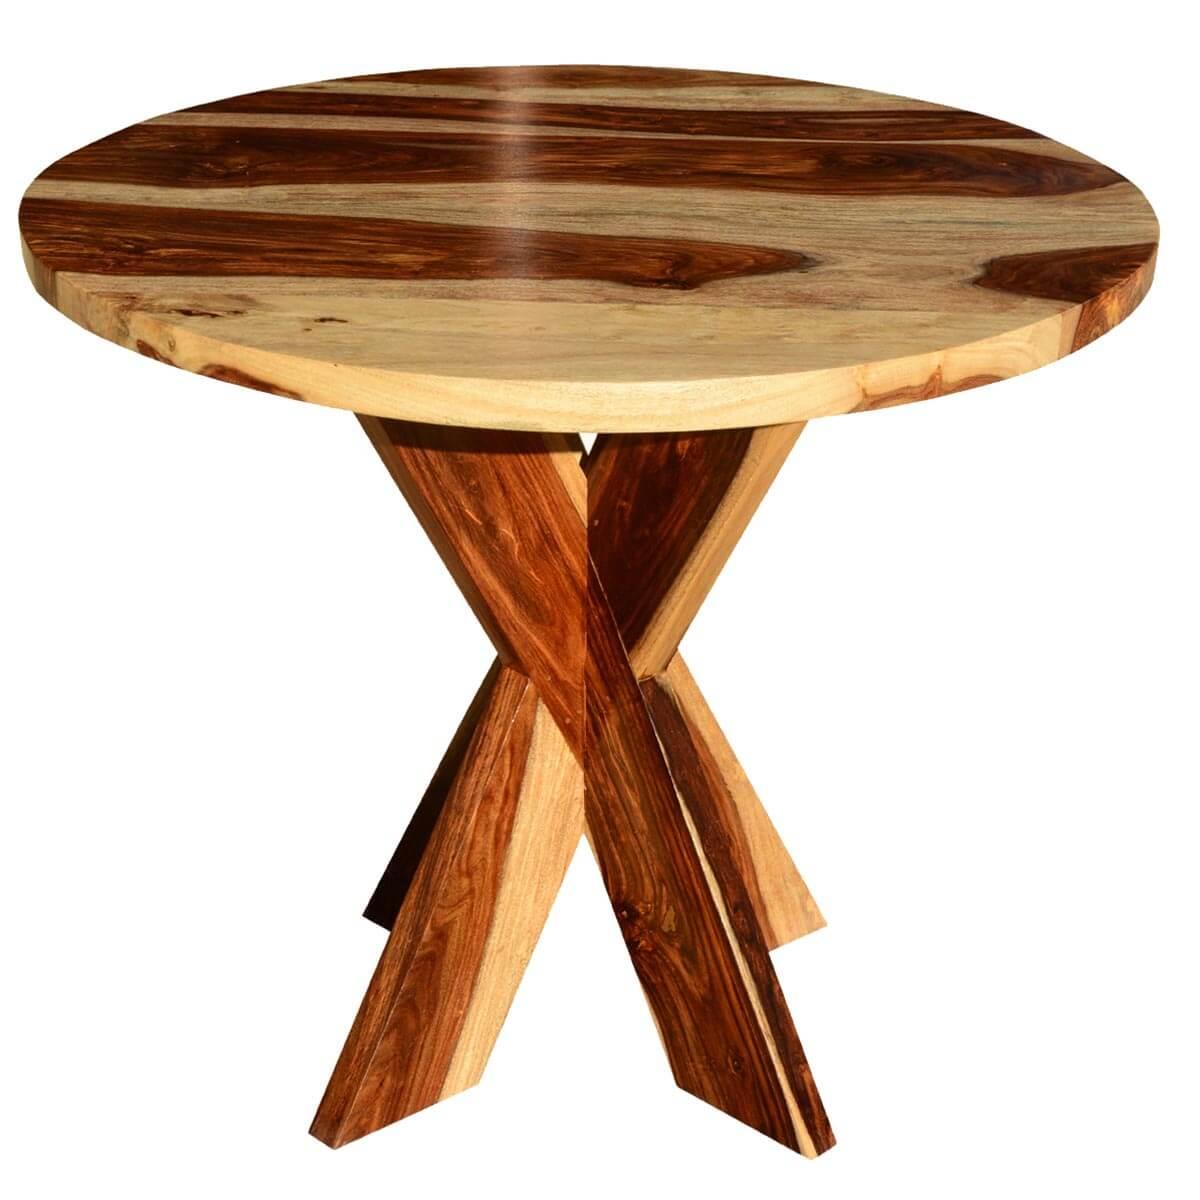 dallas solid wood x pedestal round dining table on solid wood dining table id=16443